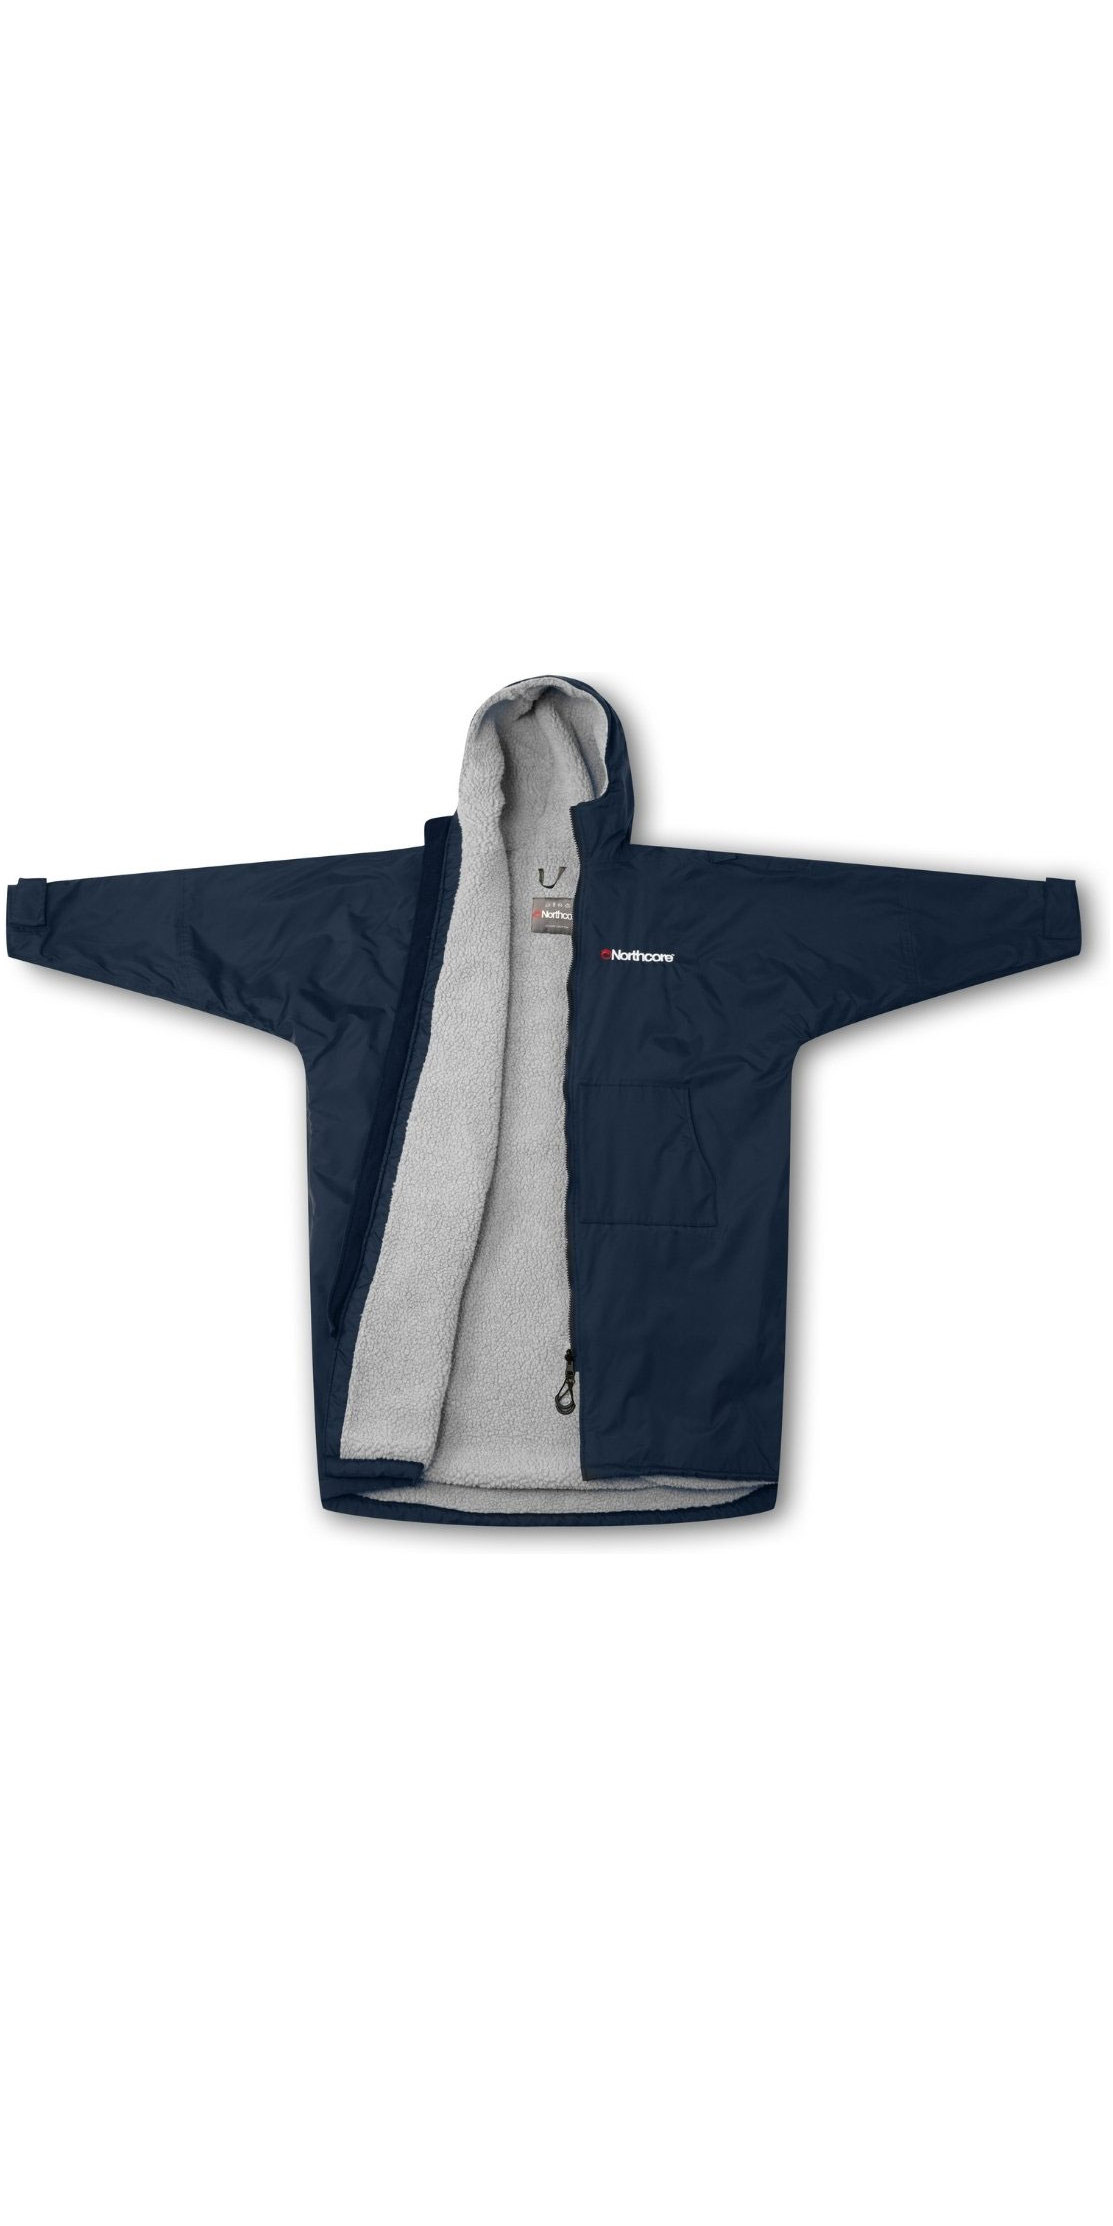 2019 Northcore Beach Basha Sport Long Sleeve Changing Robe Blue NOCO24N